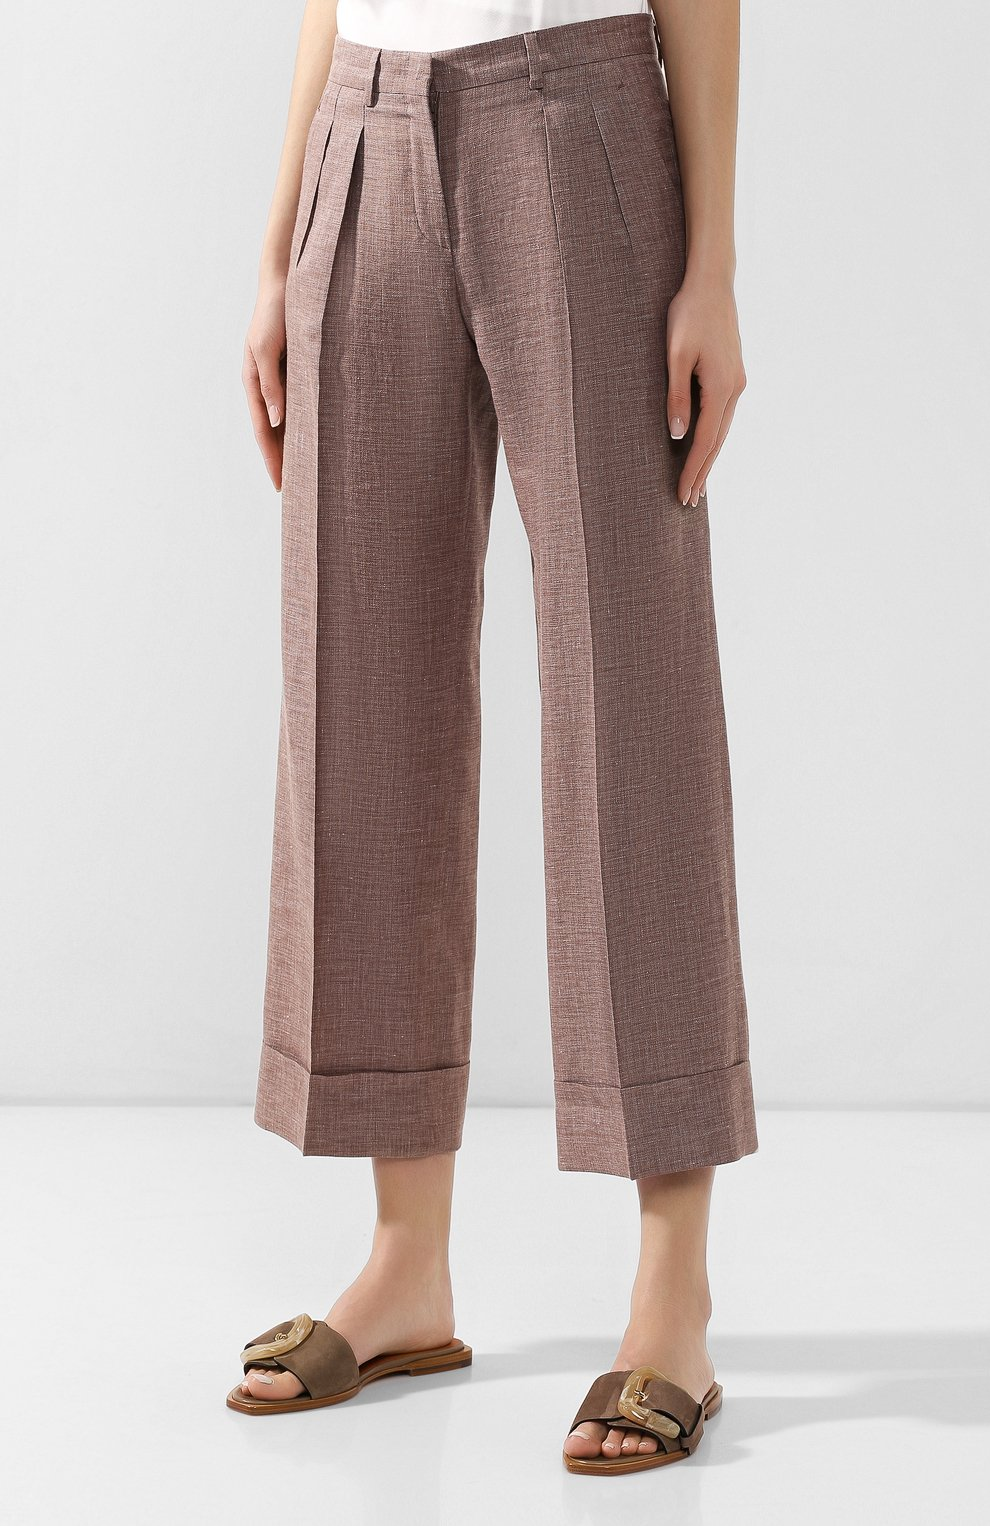 Женские брюки с отворотами KITON коричневого цвета, арт. D47119K06P19 | Фото 3